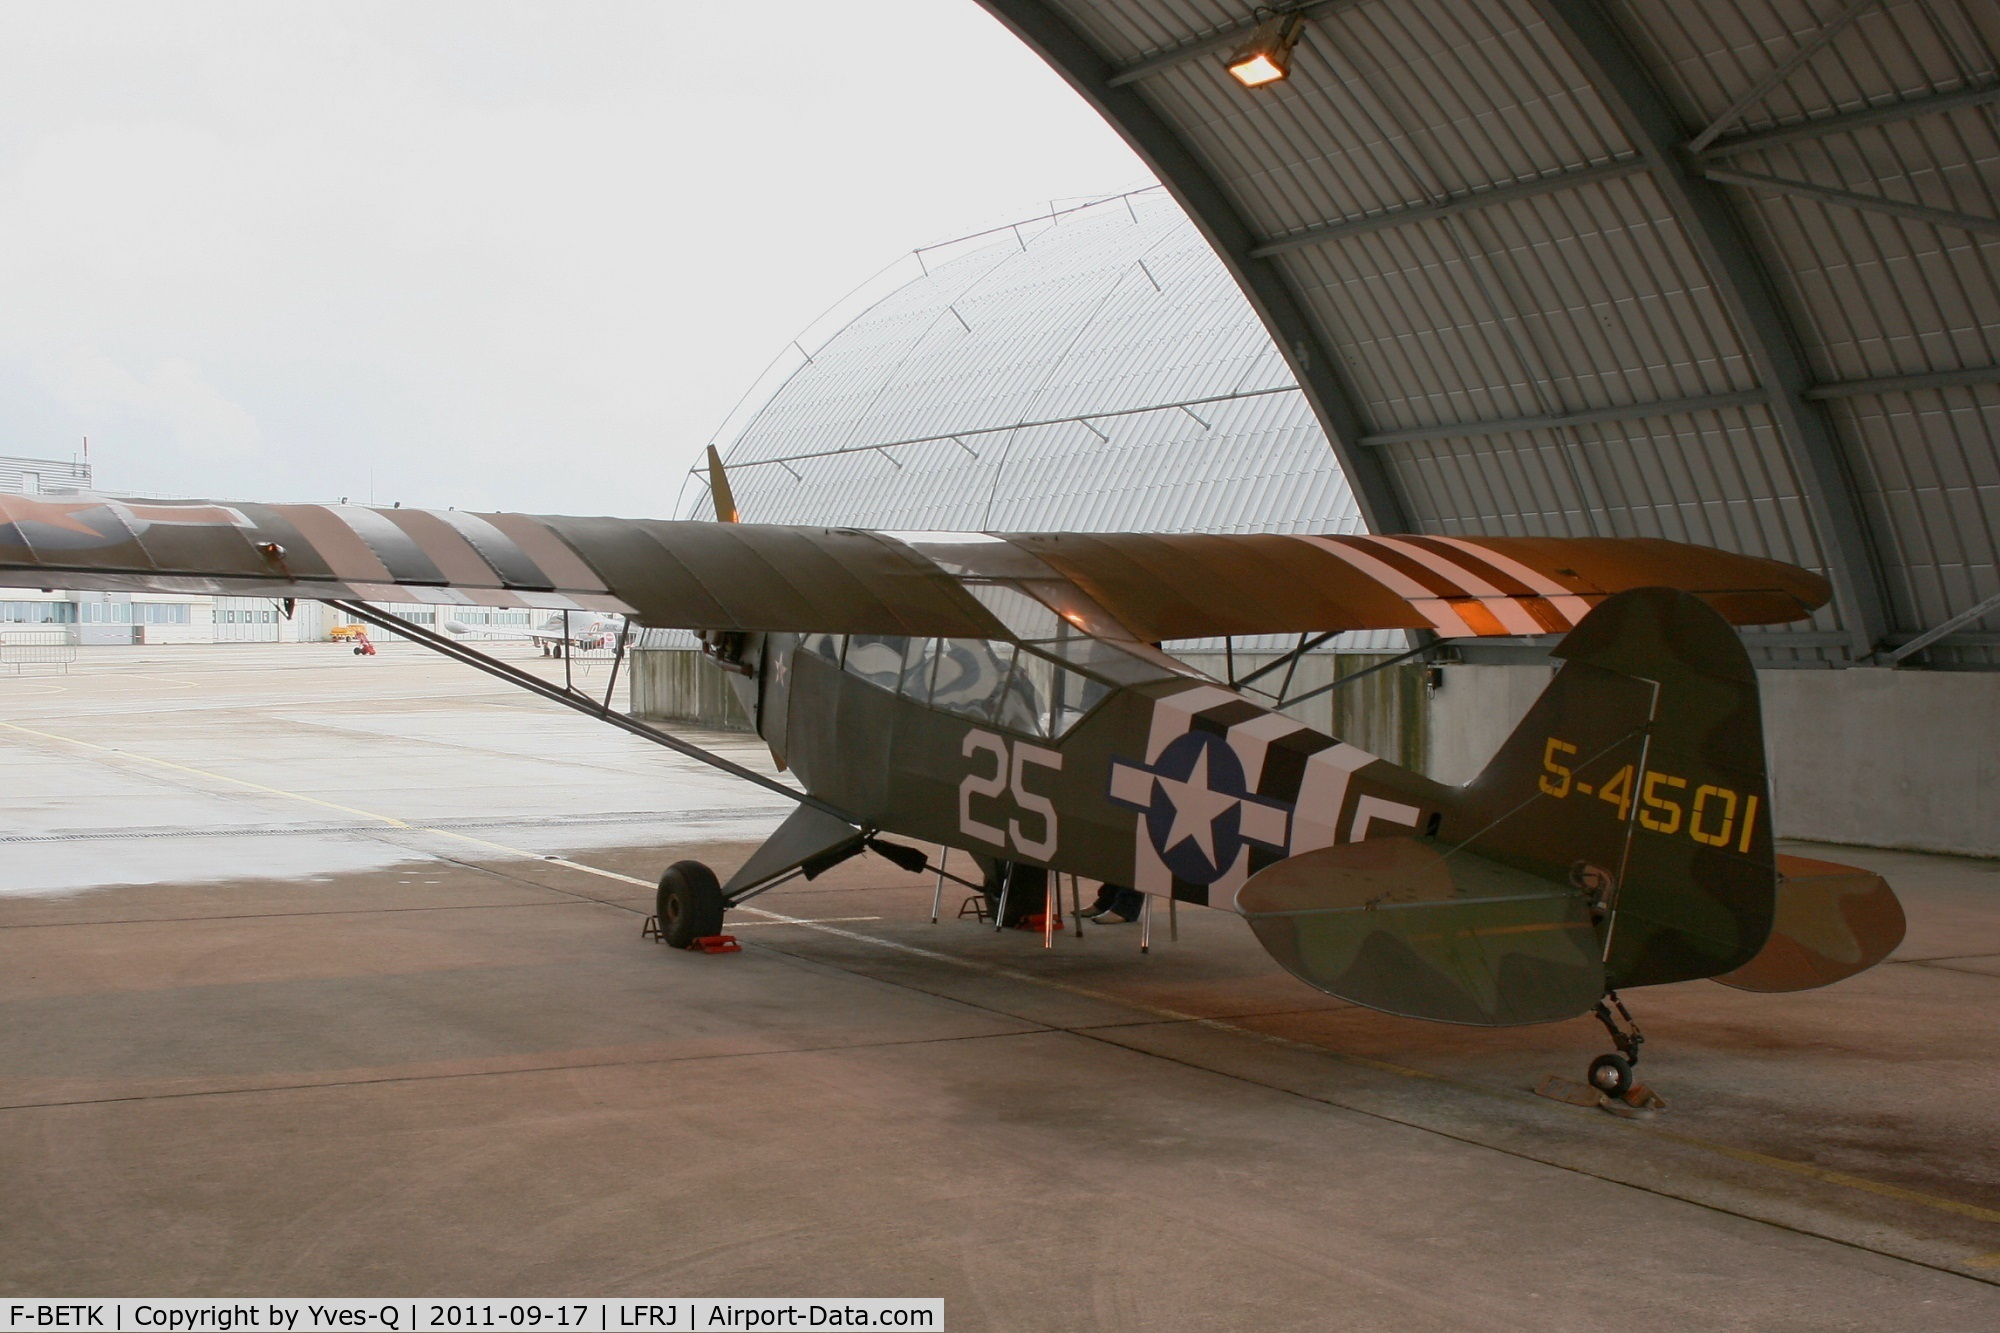 F-BETK, 1945 Piper L-4J Grasshopper (J3C-65D) C/N 13241, Piper J3C-65 Cub, Landivisiau Naval Air Base (LFRJ) Heritage day 2011